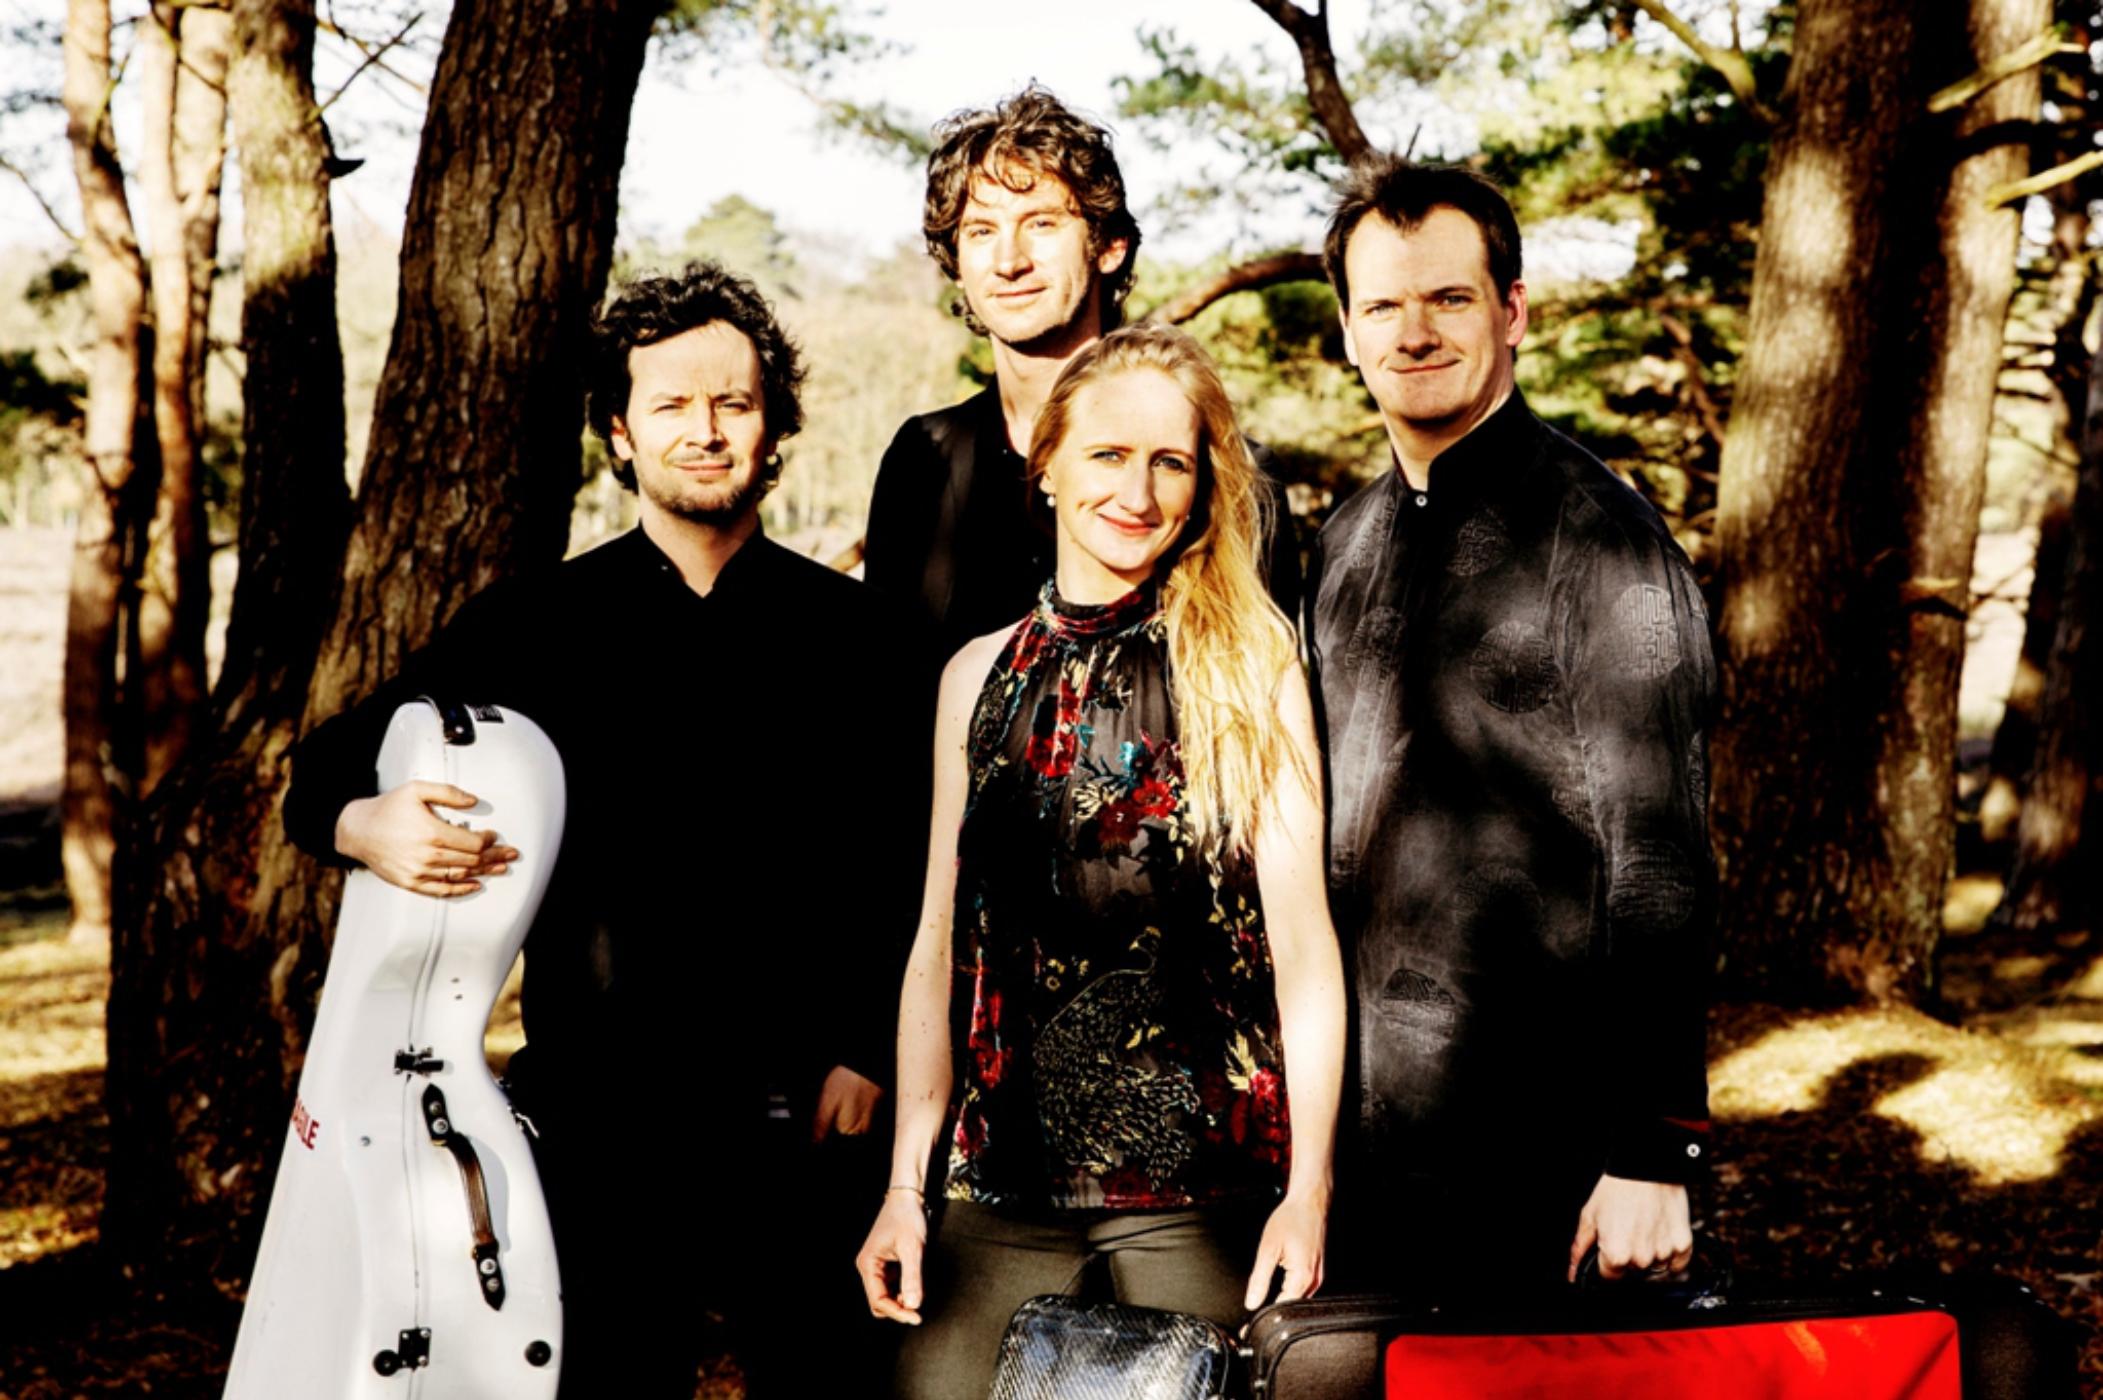 Navarra-Quartet-photo-please-credit-Sarah-Wijzenbeek-3a.jpg